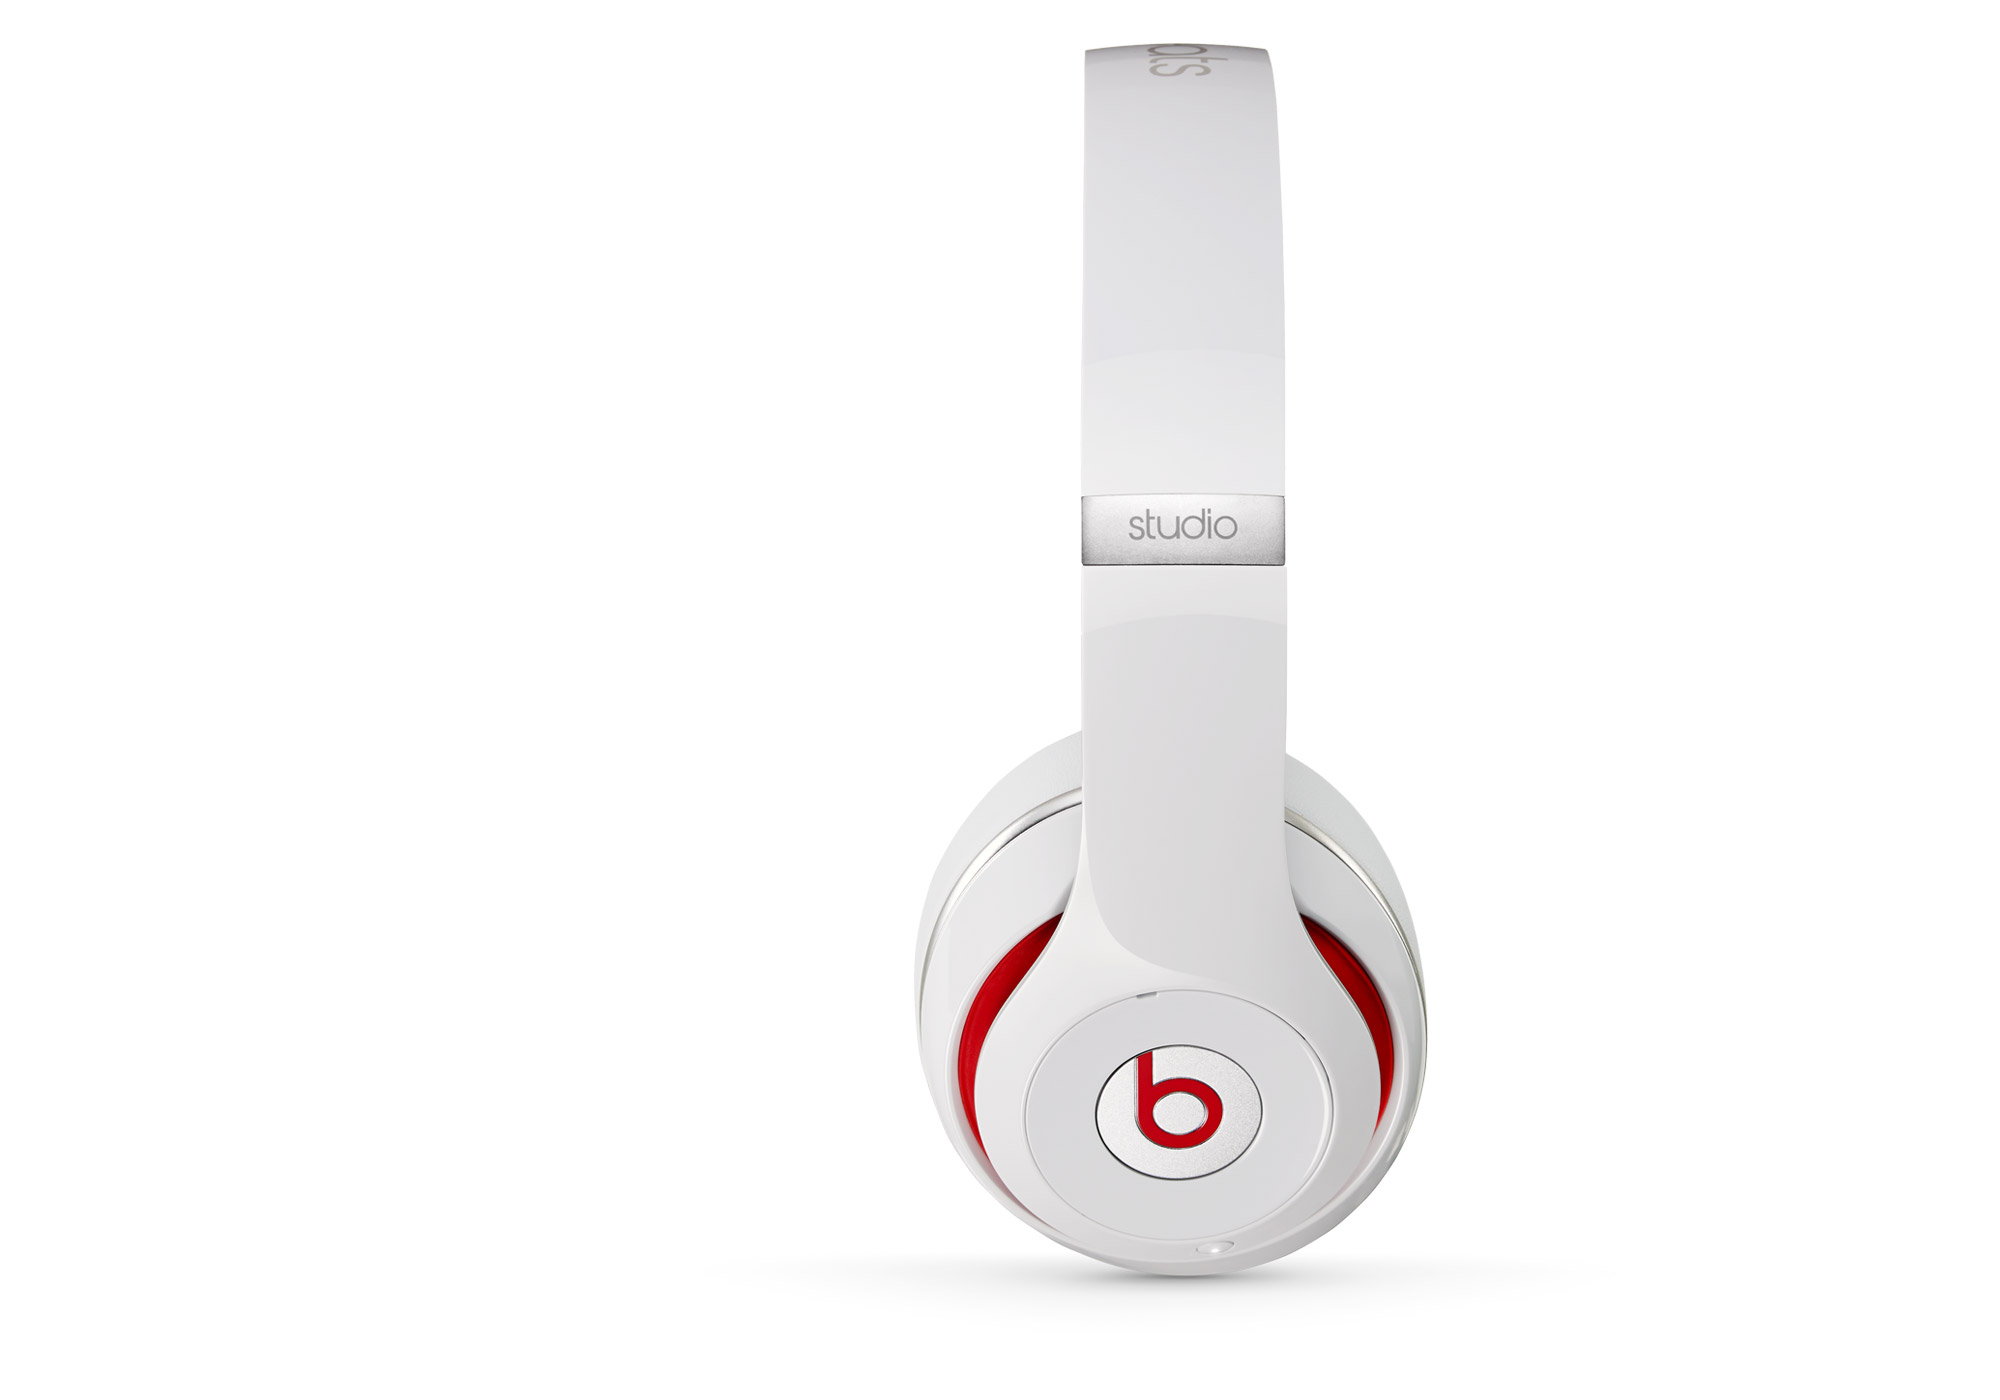 Hoogwaardige hoofdtelefoon | Beats Studio van Beats by Dre